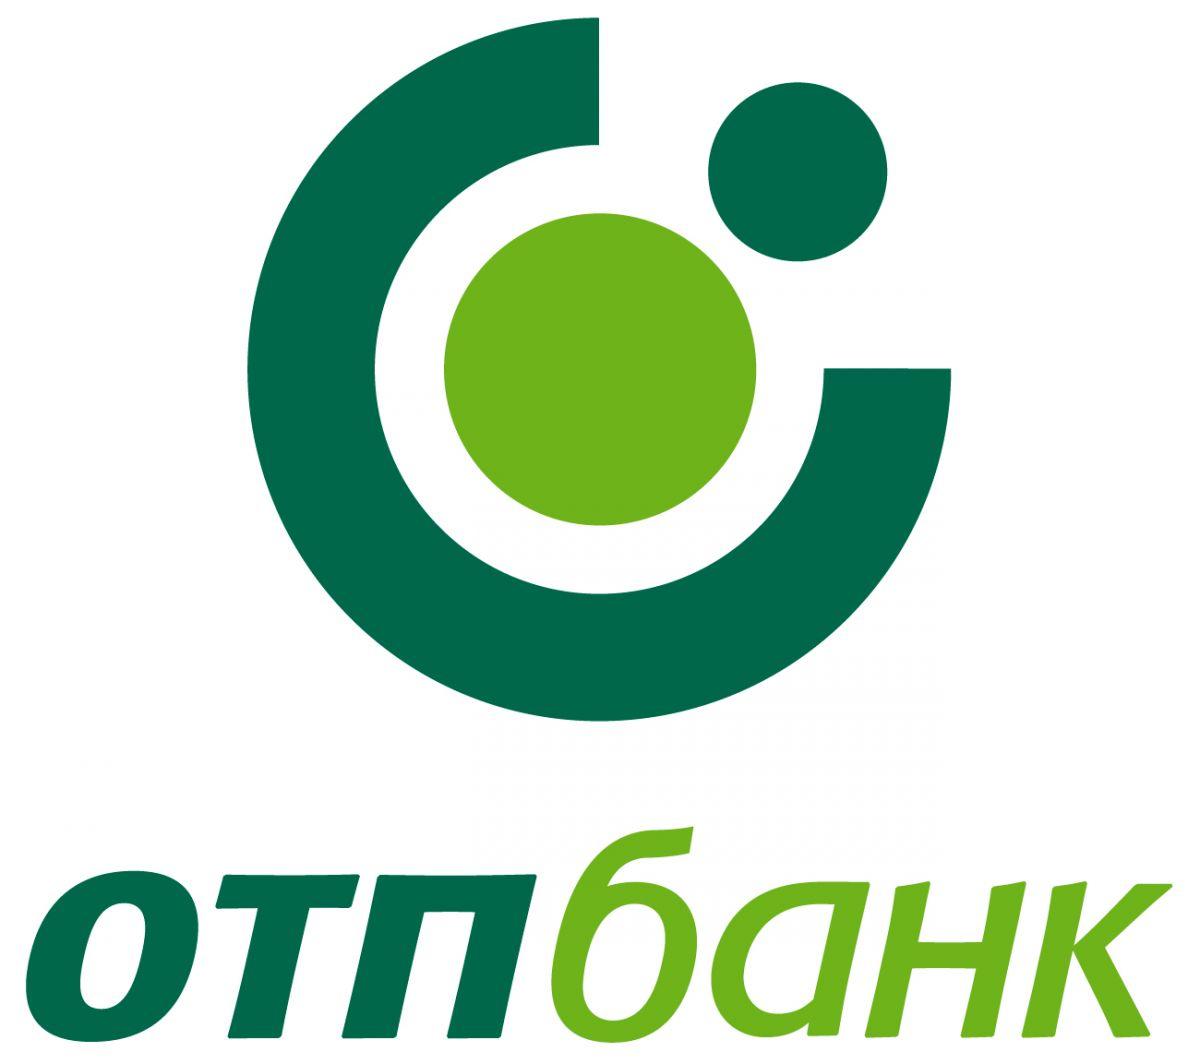 potrebitelskij-kredit-vzyat_17